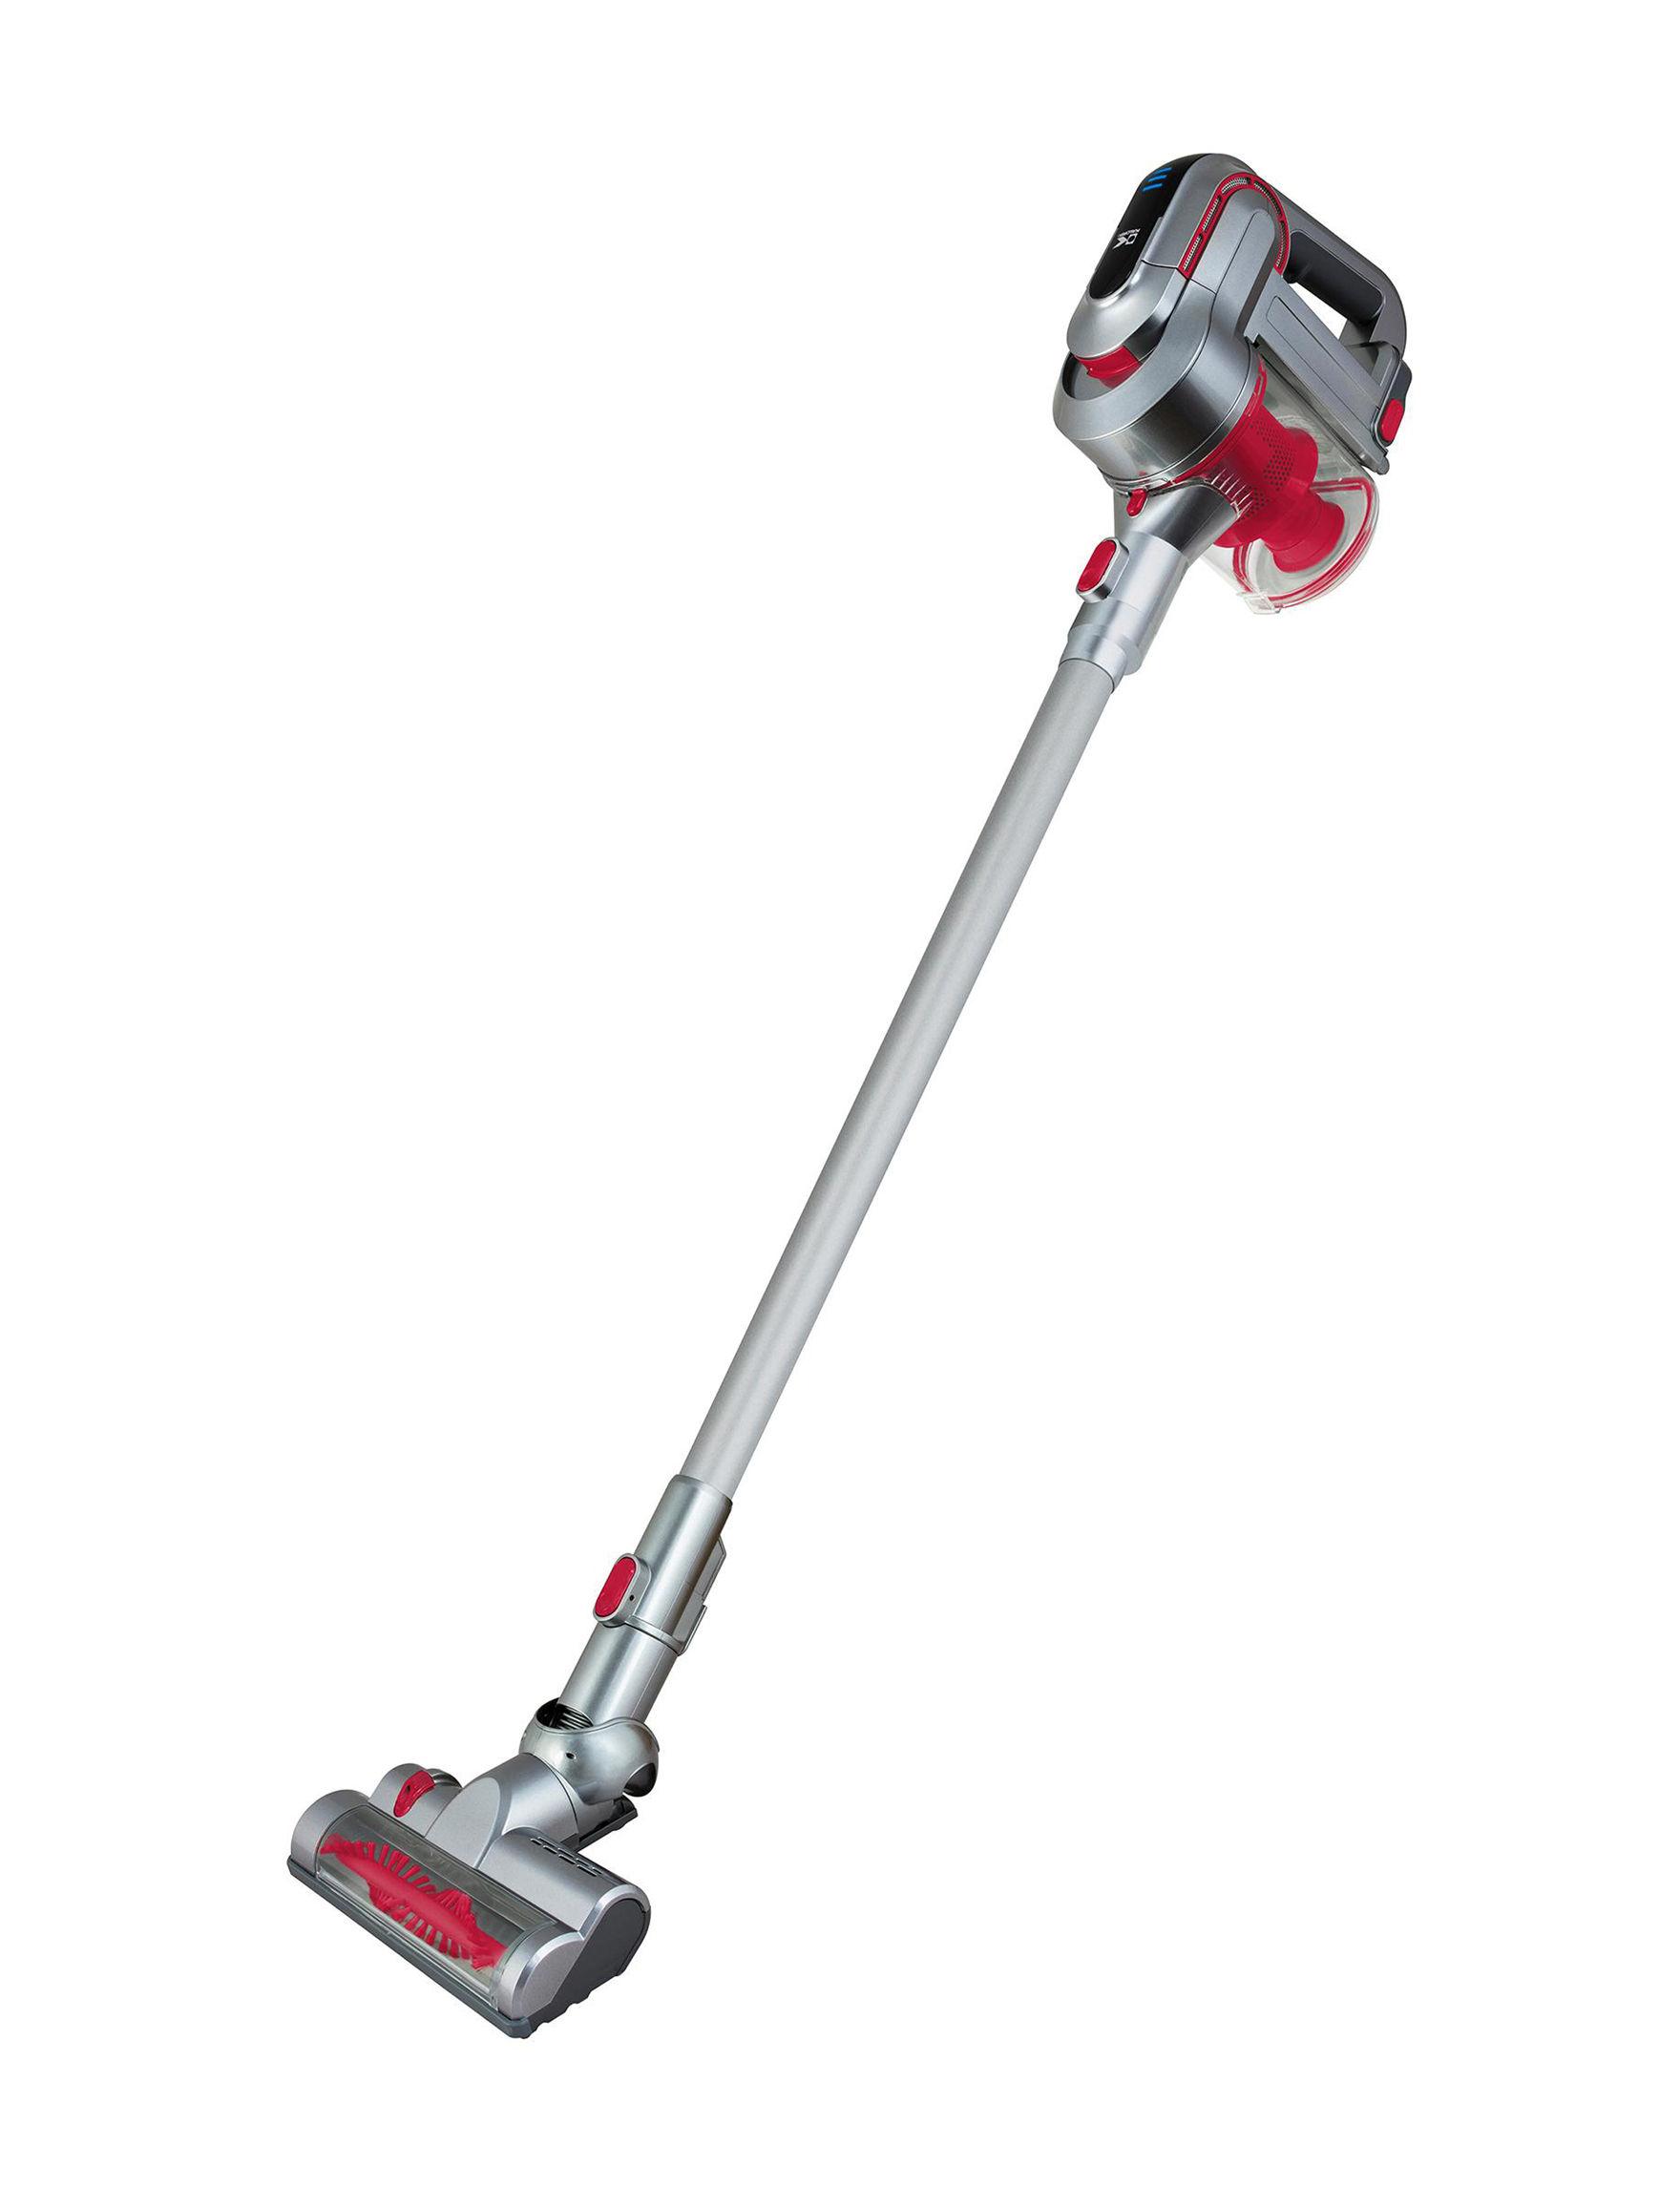 Kalorik Red Vacuums & Floor Care